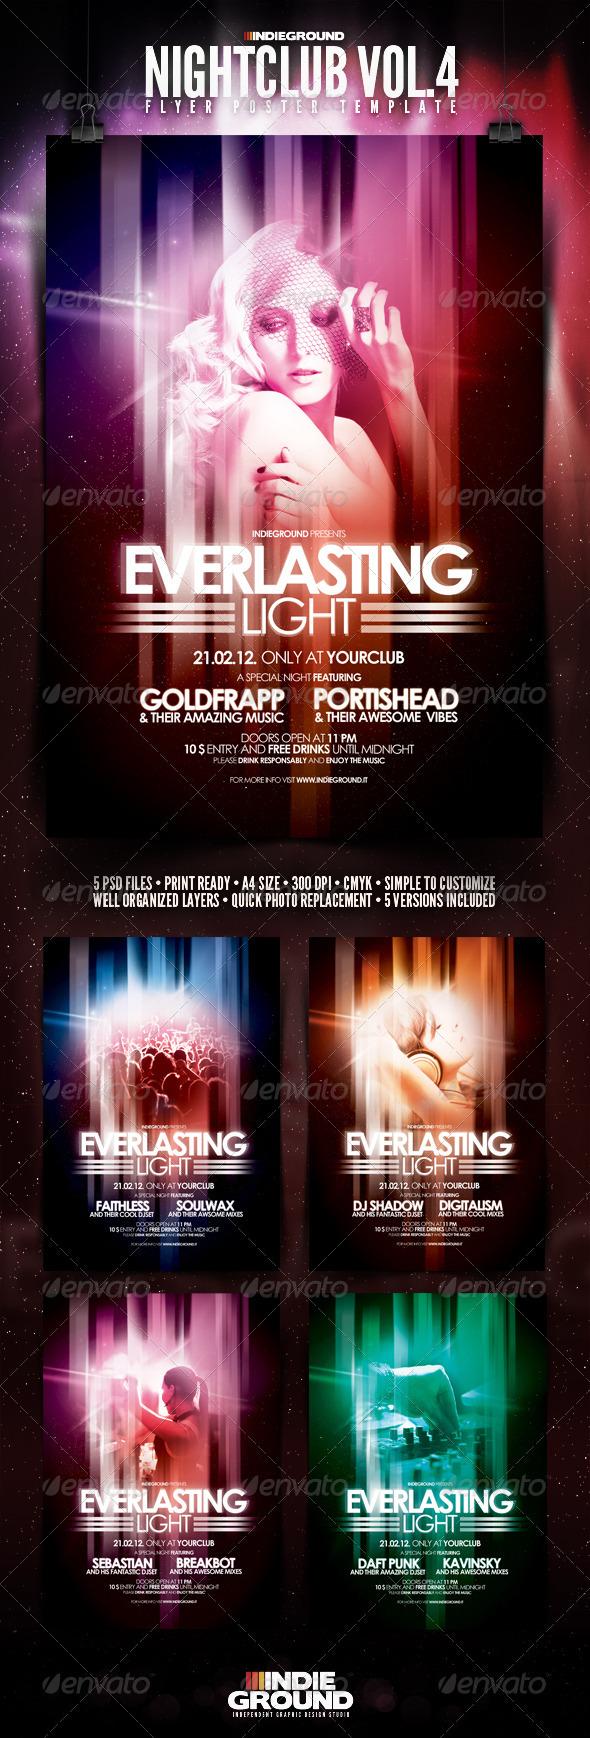 GraphicRiver Nightclub Flyer Poster Vol 4 162762